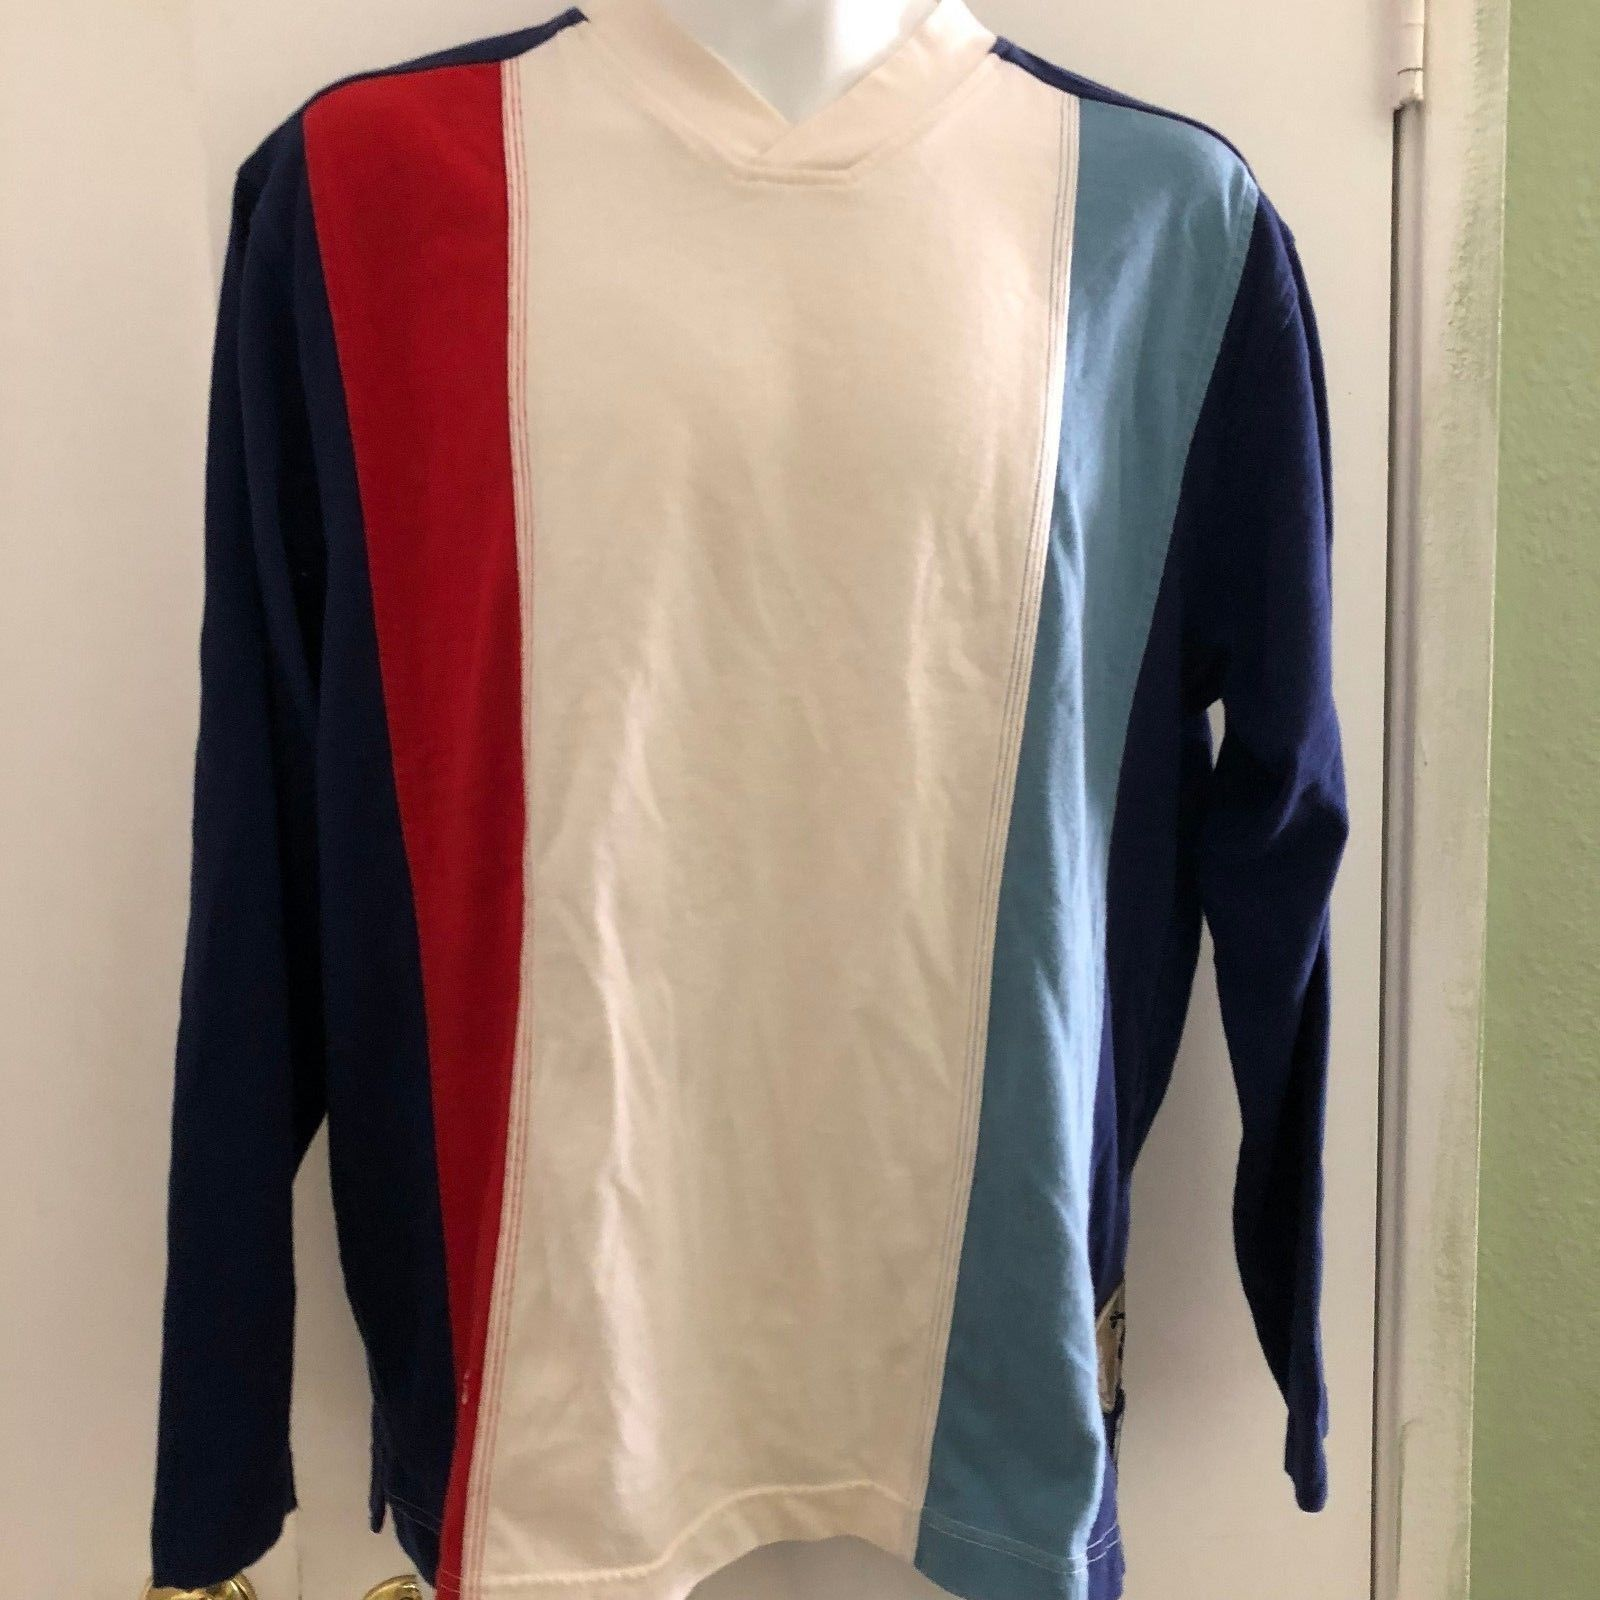 Adidas Small VTG USA Olympics LS V Neck Shirt RARE Striped Official outfitter